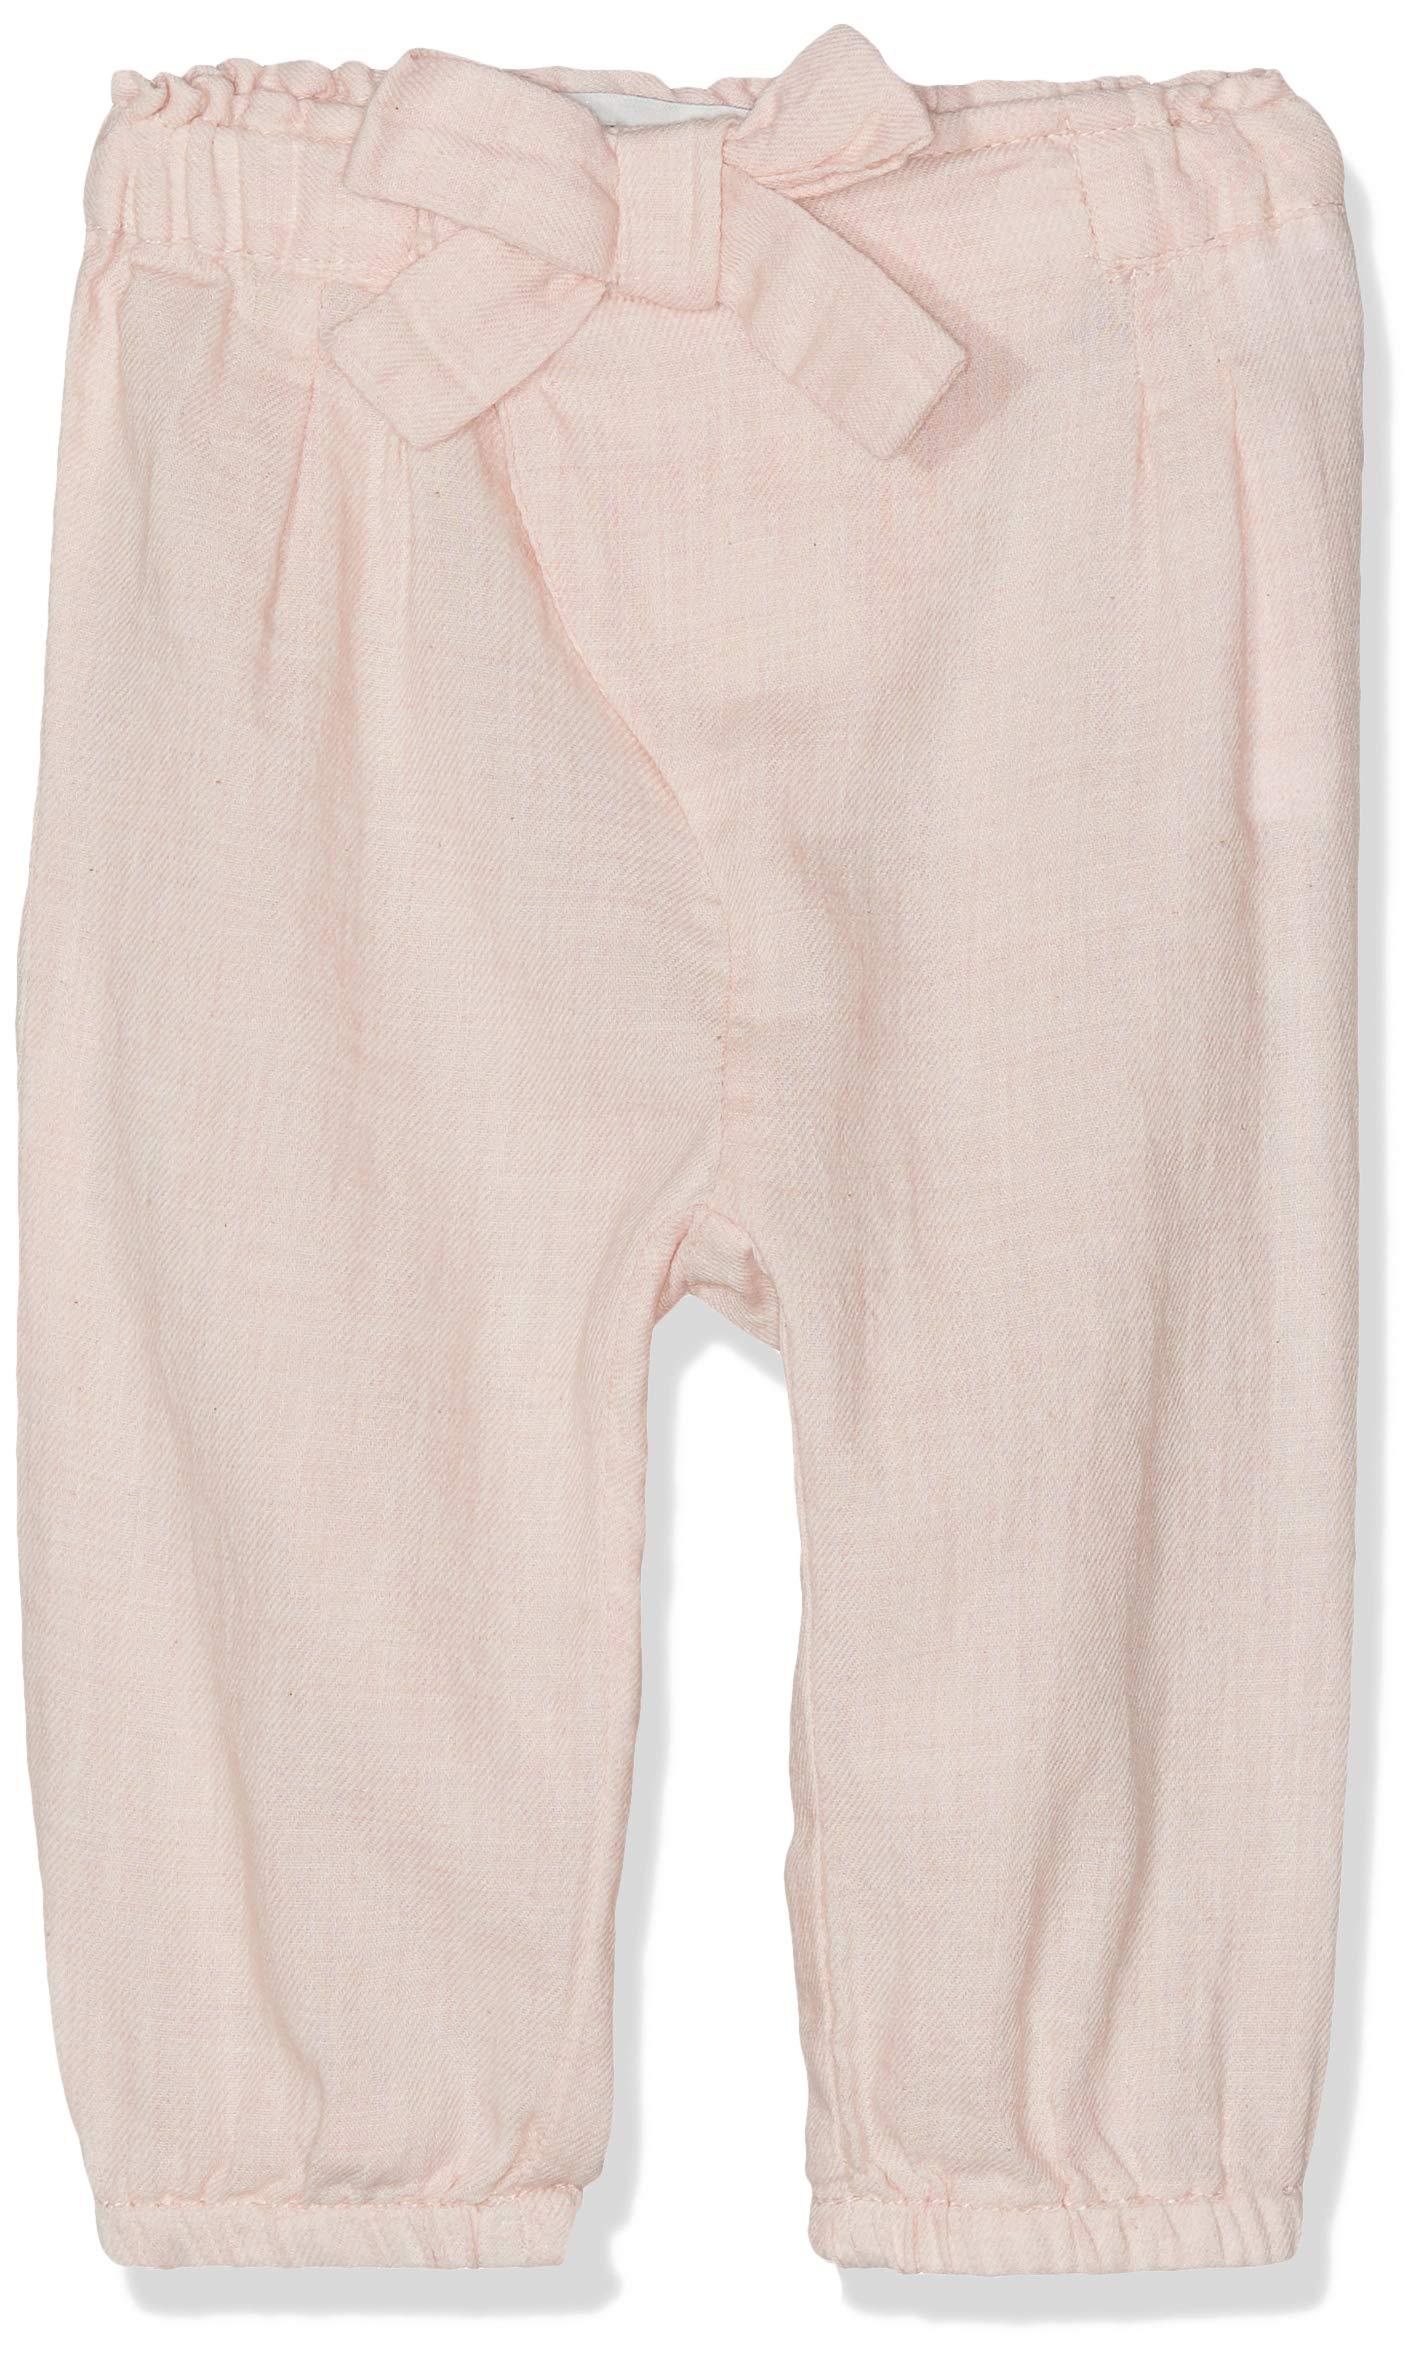 NAME IT Nbfdajla Pant Pantalones para Bebés 1